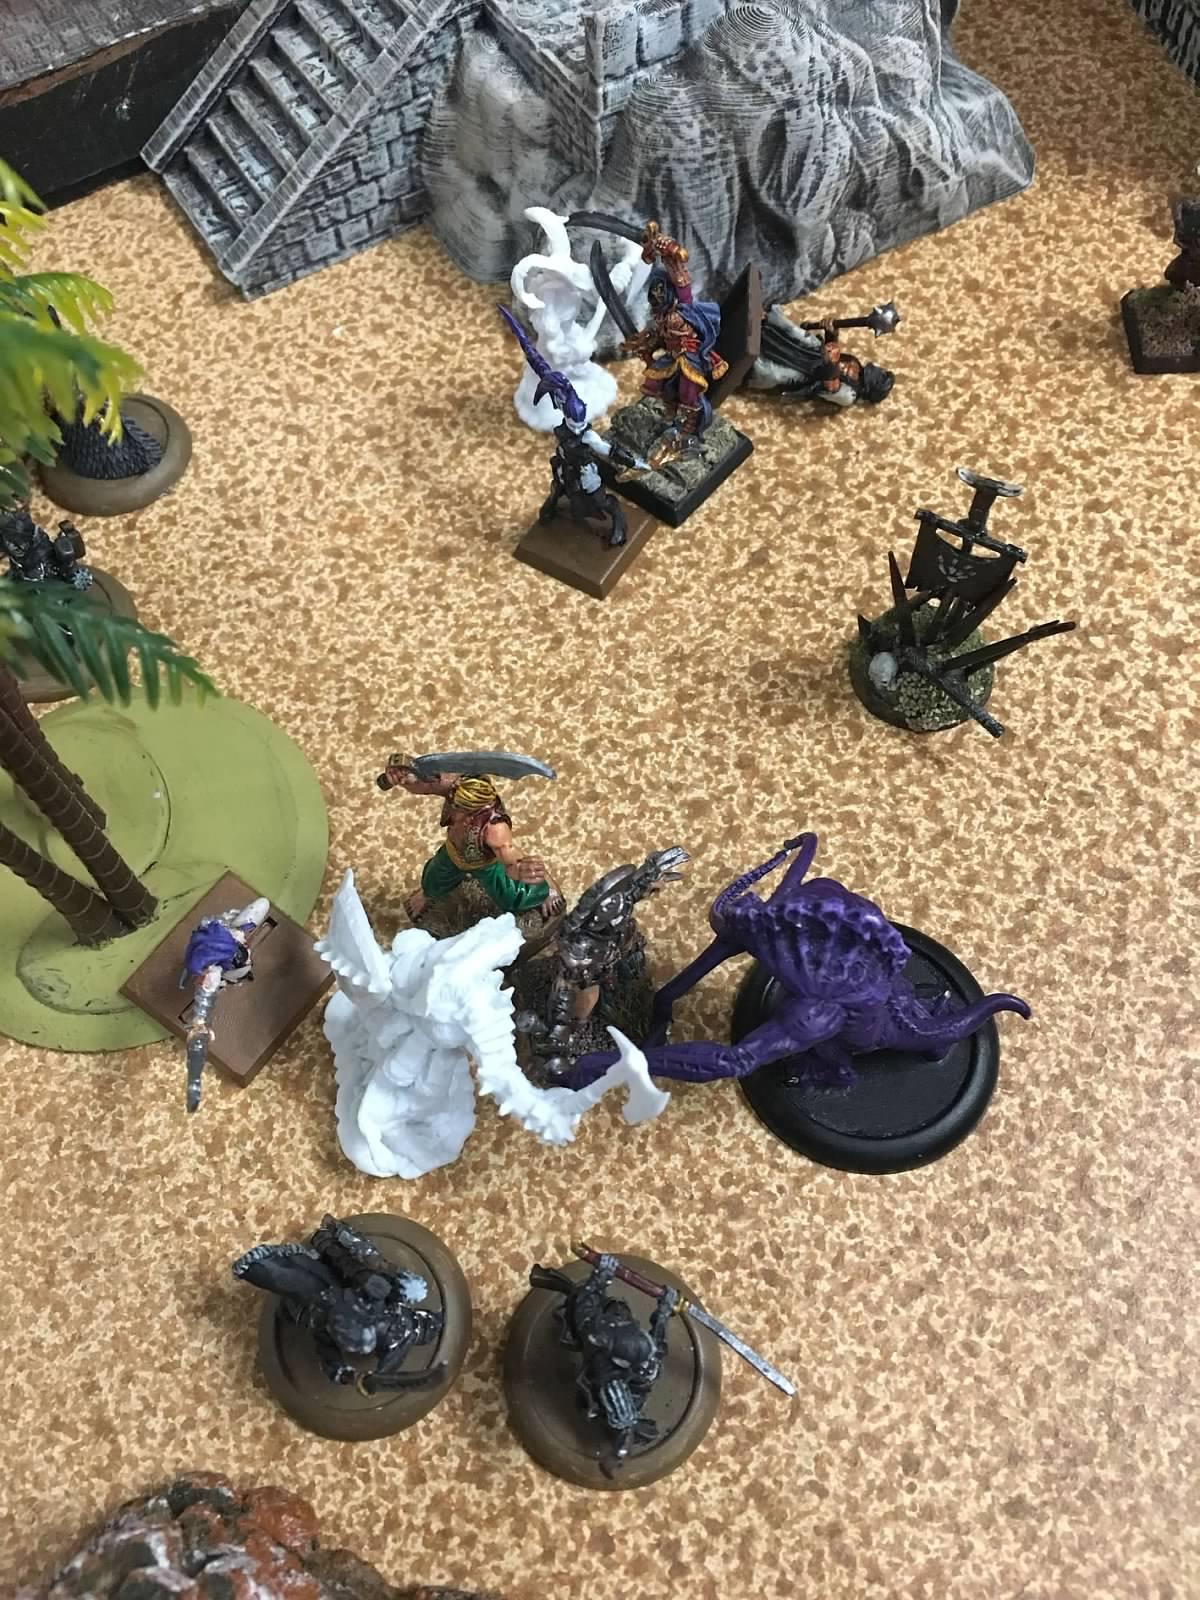 Tales of the Arabyan Nights Part II - Page 2 47a9d801b3127cce98549049412e00000010100AbOXDRkzbMmWA